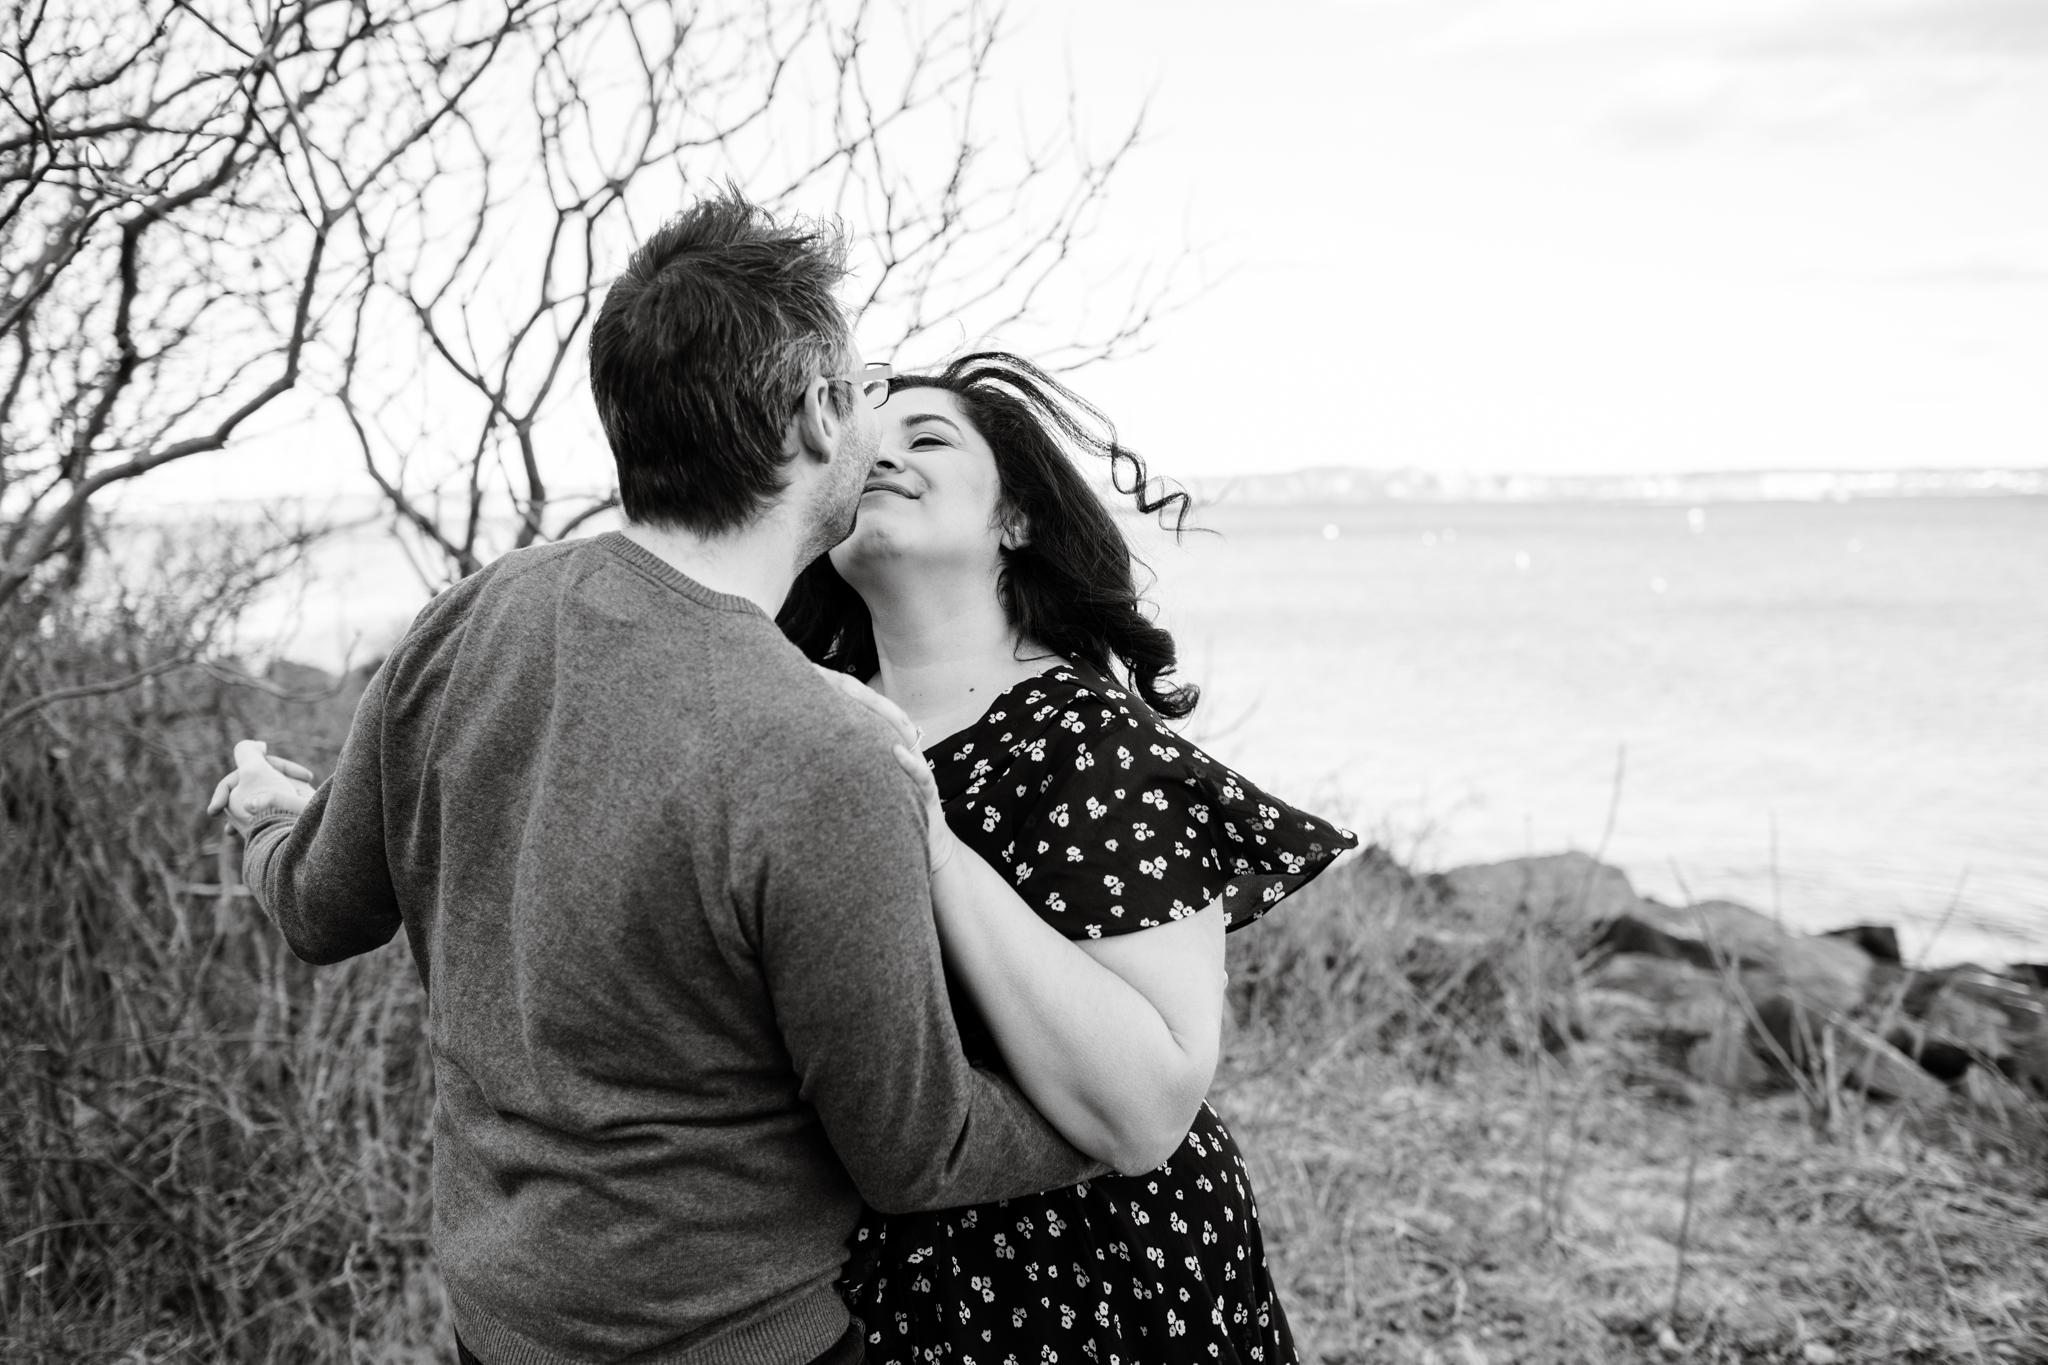 maine-wedding-photographer-engagement-session  -40.jpg